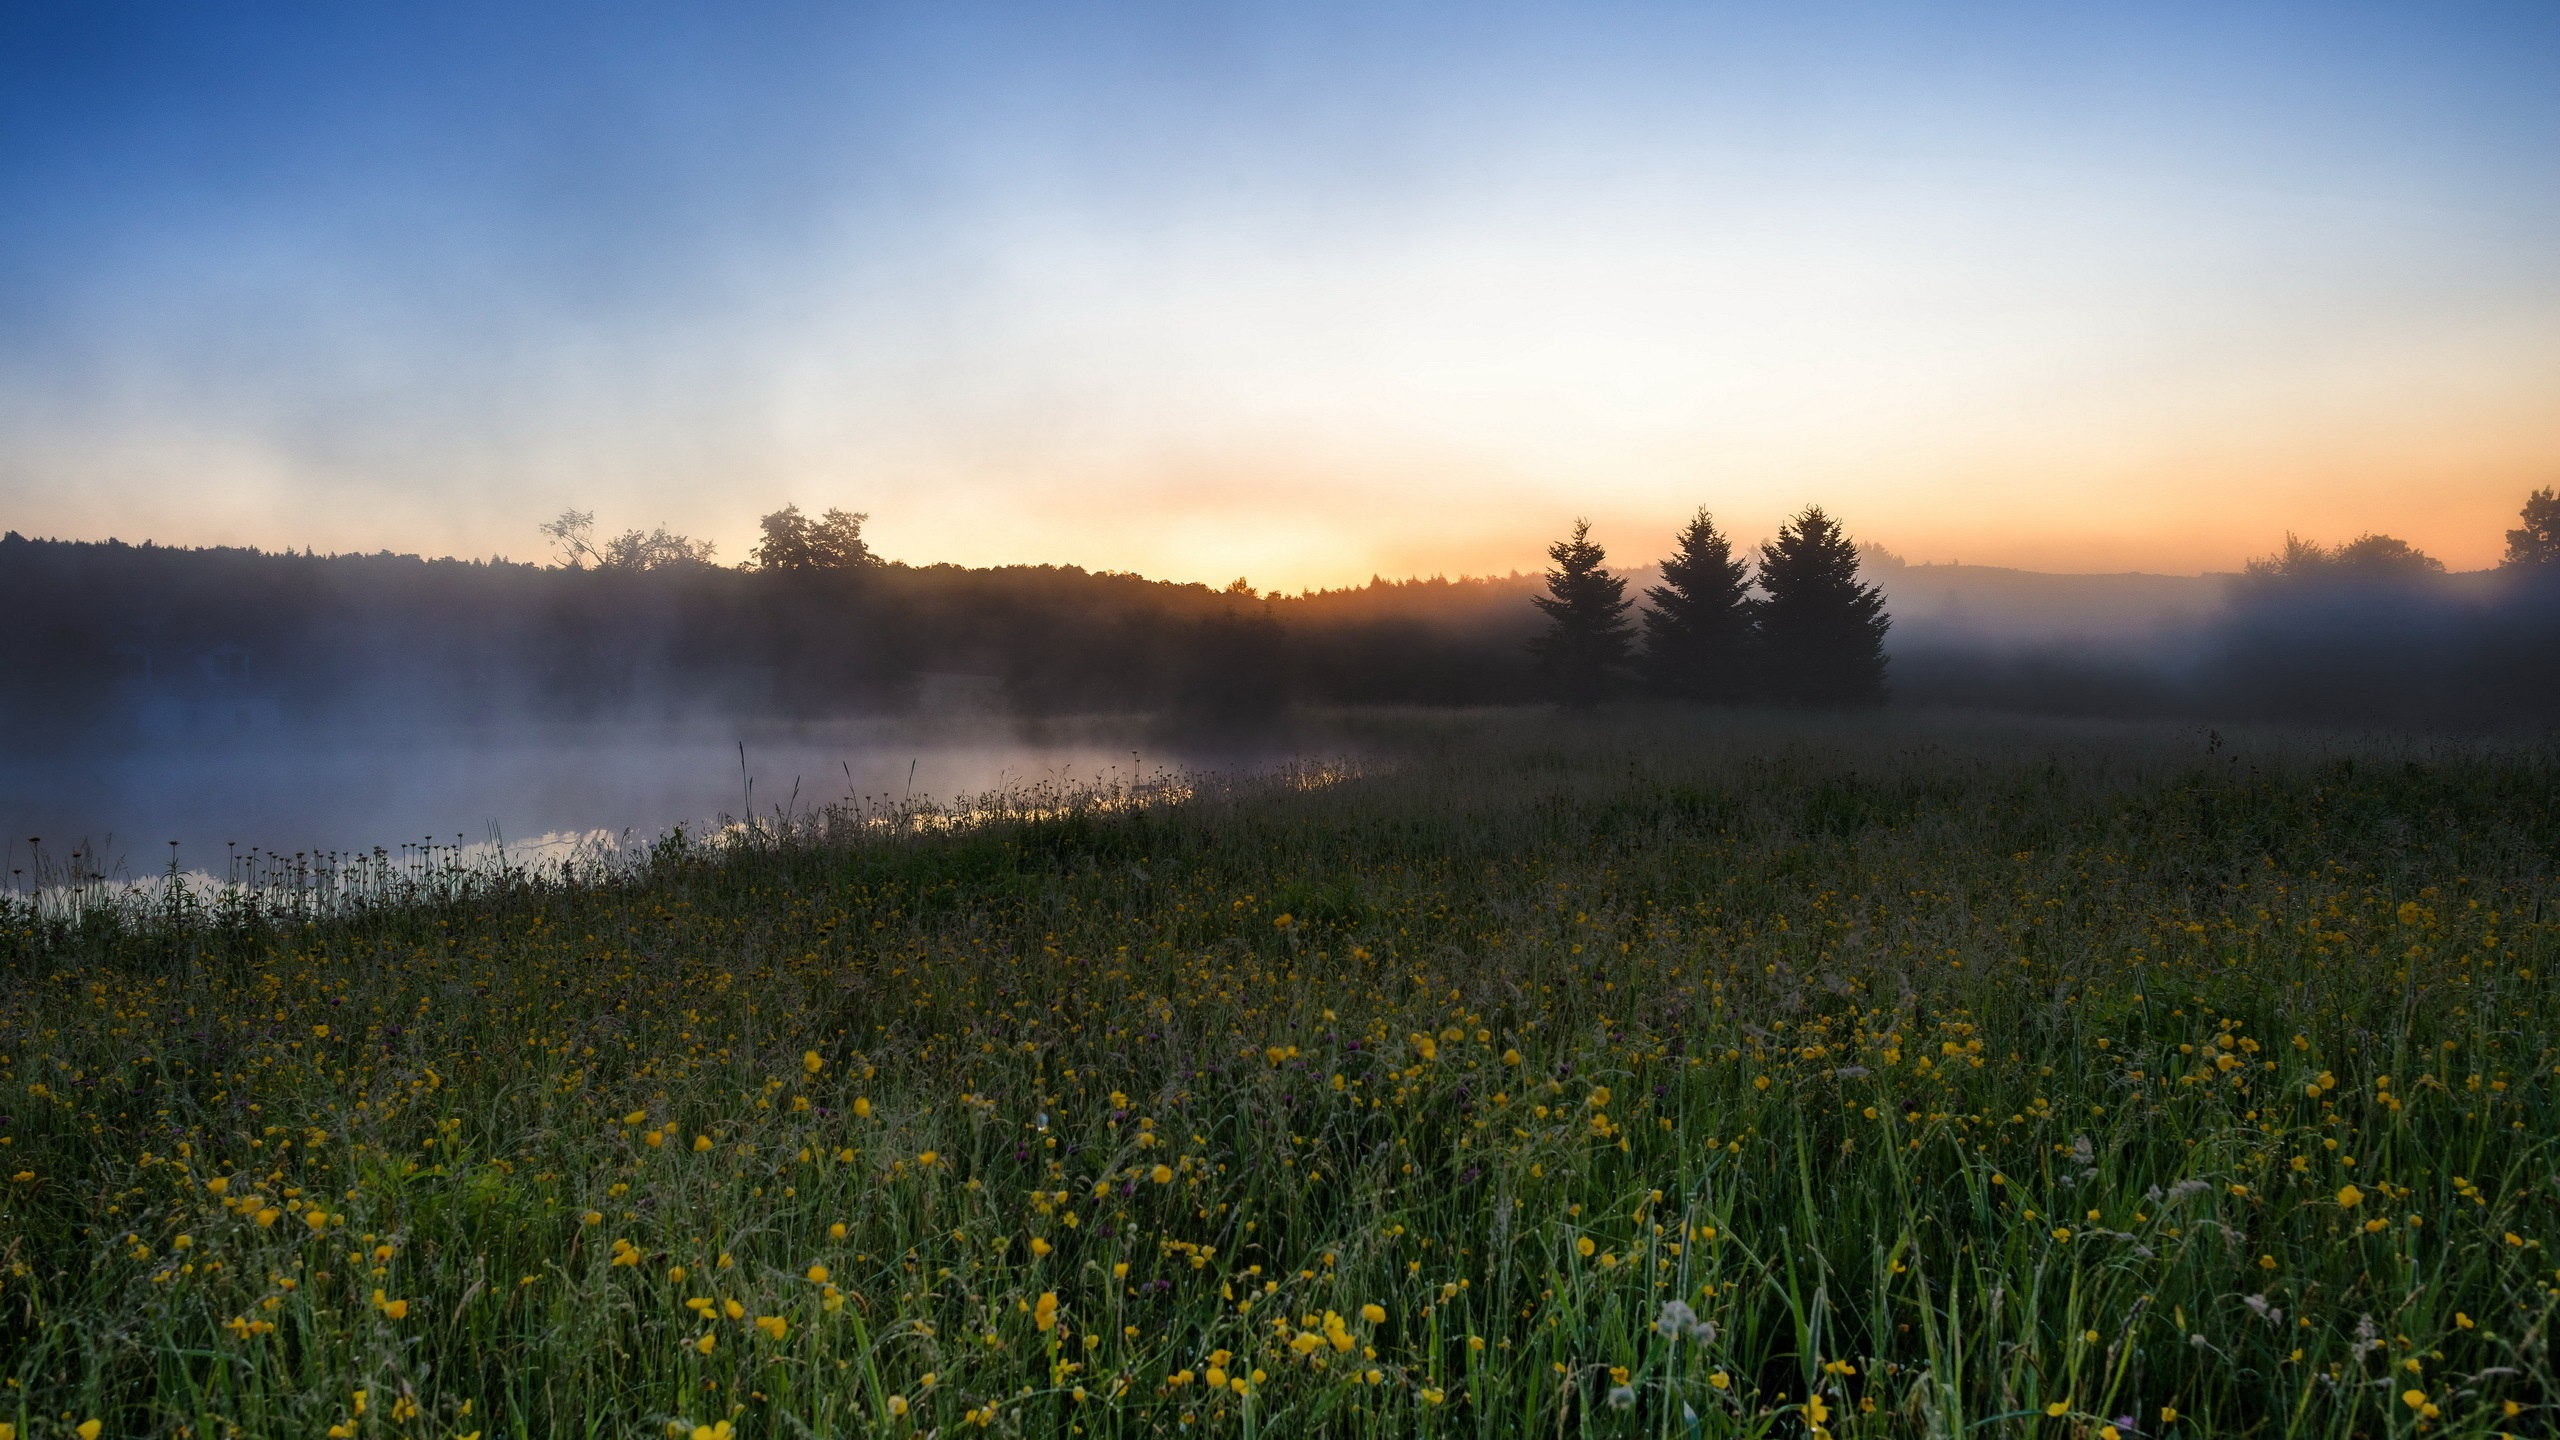 Fonds d 39 cran t l charger 2560x1440 matin paysages champs for Fond ecran qhd